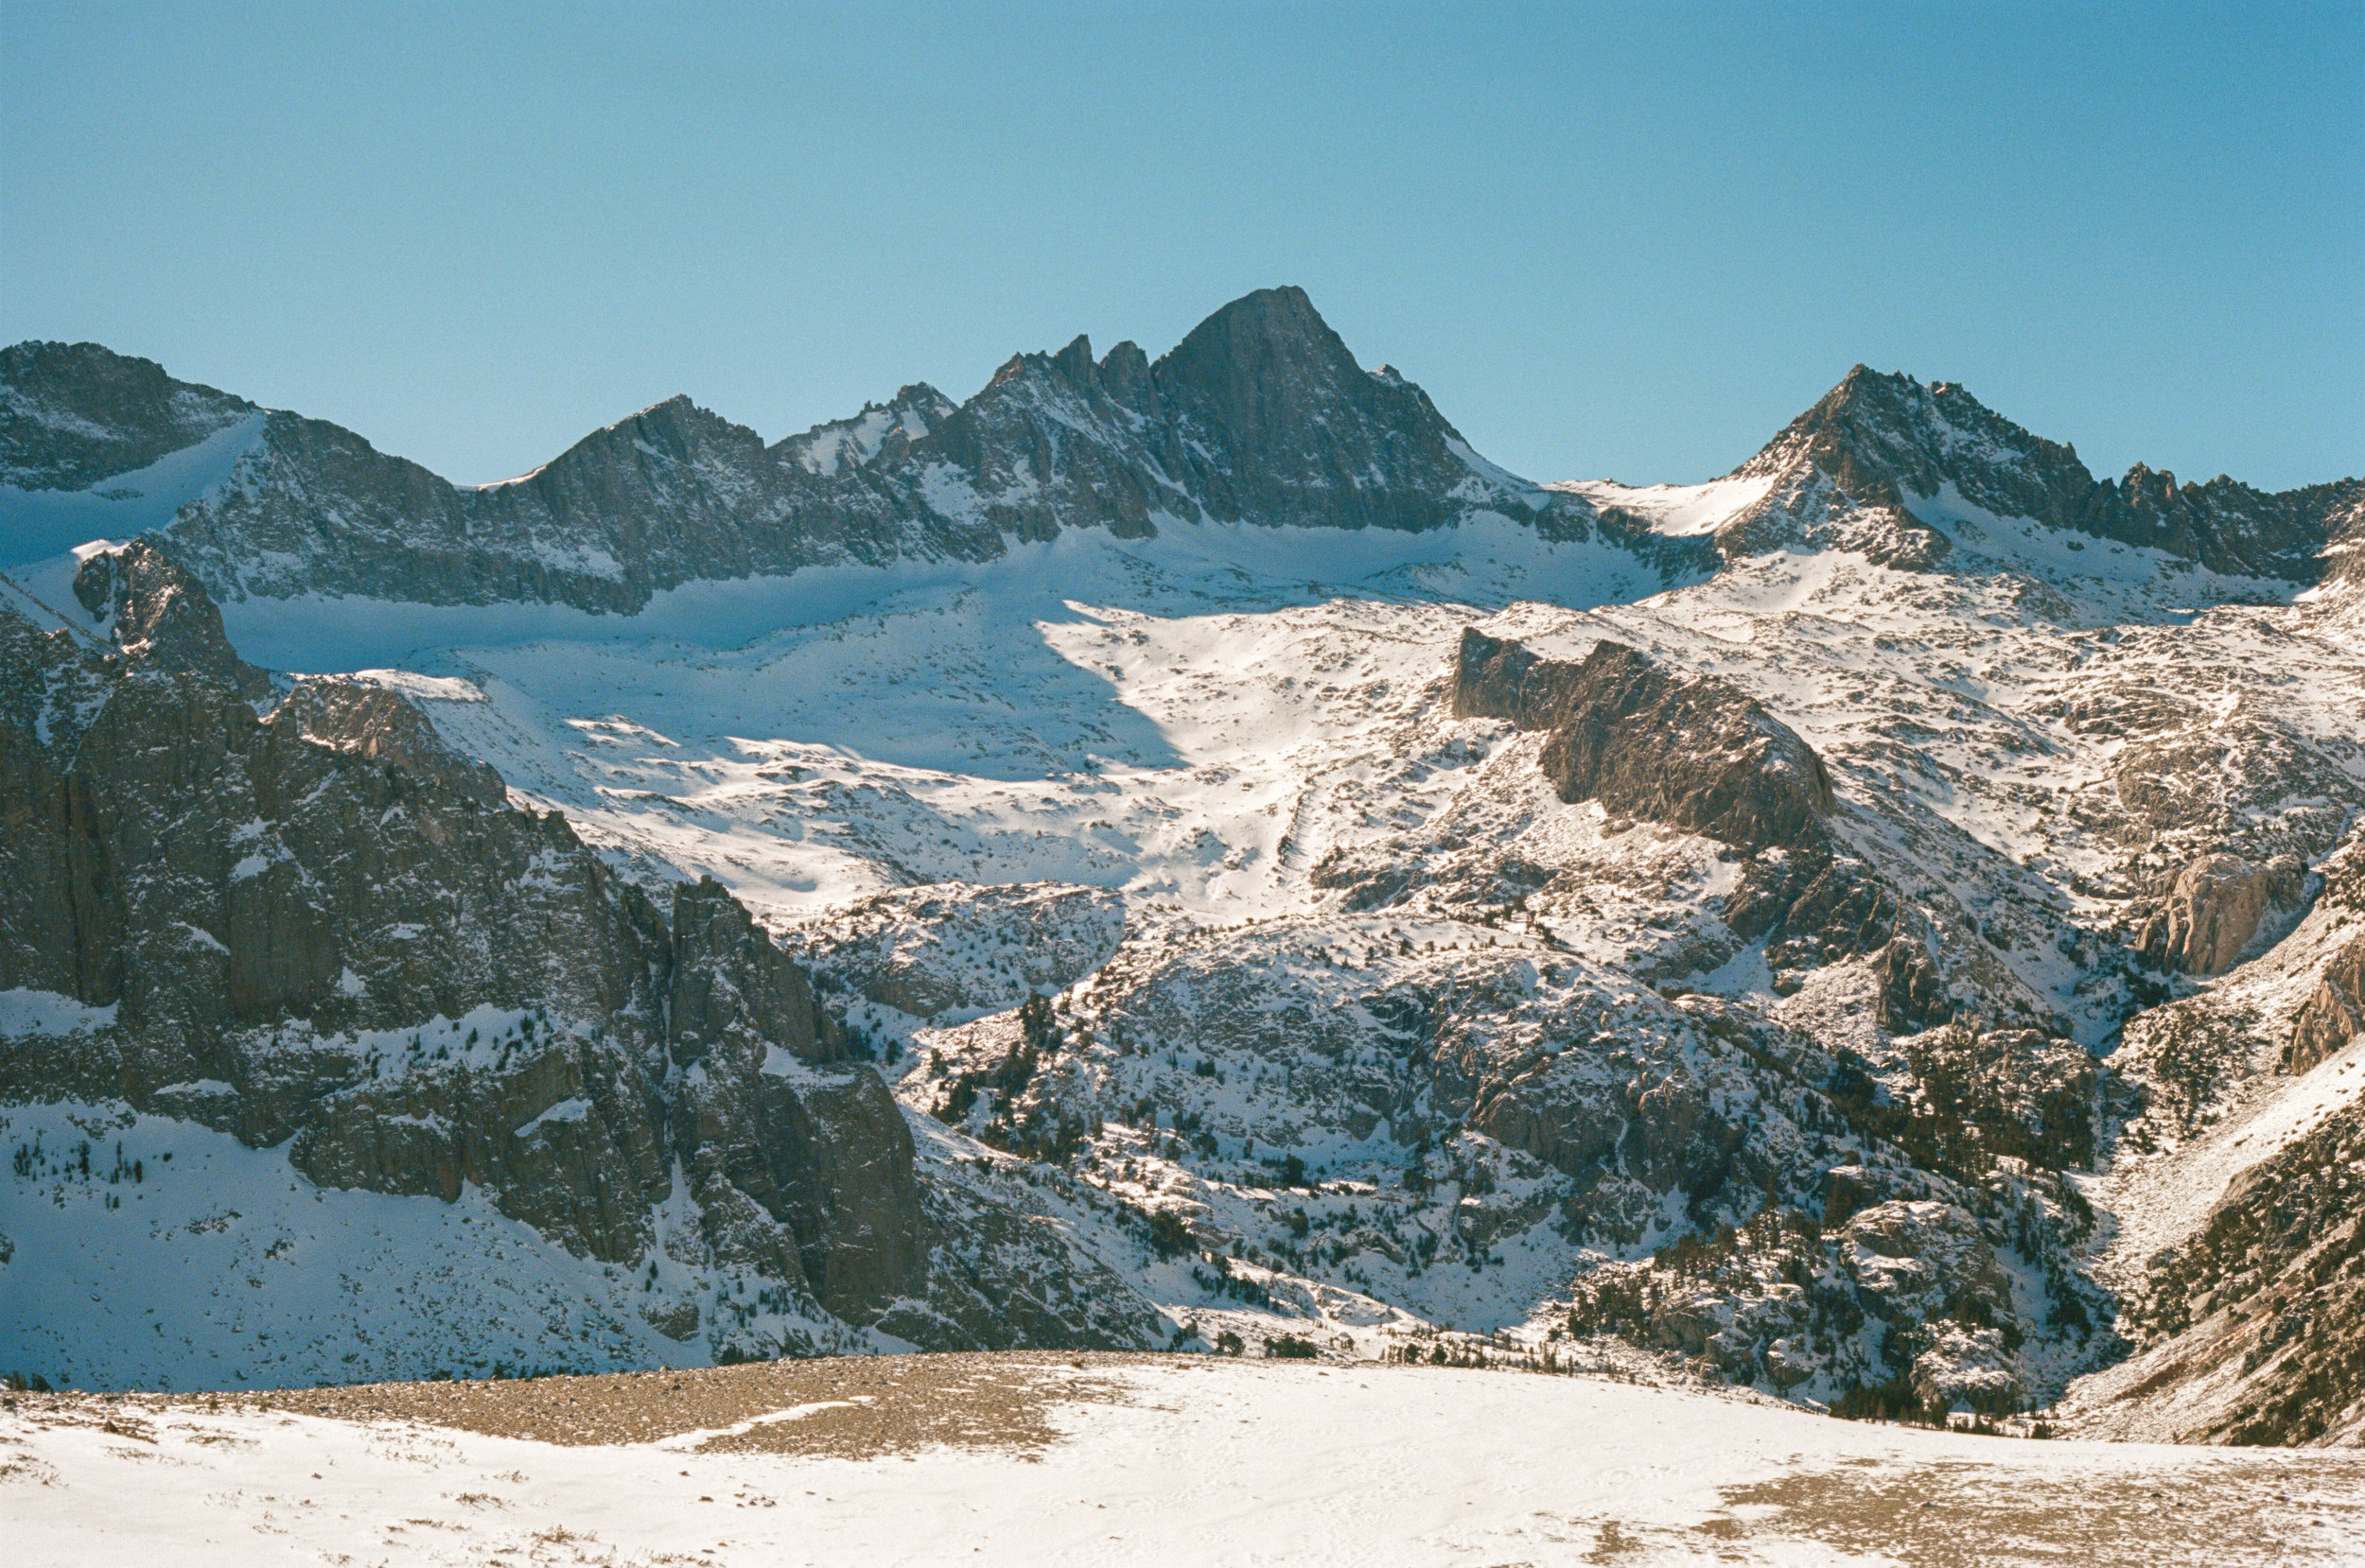 Sierra_MidWinter_Ski-16.jpg